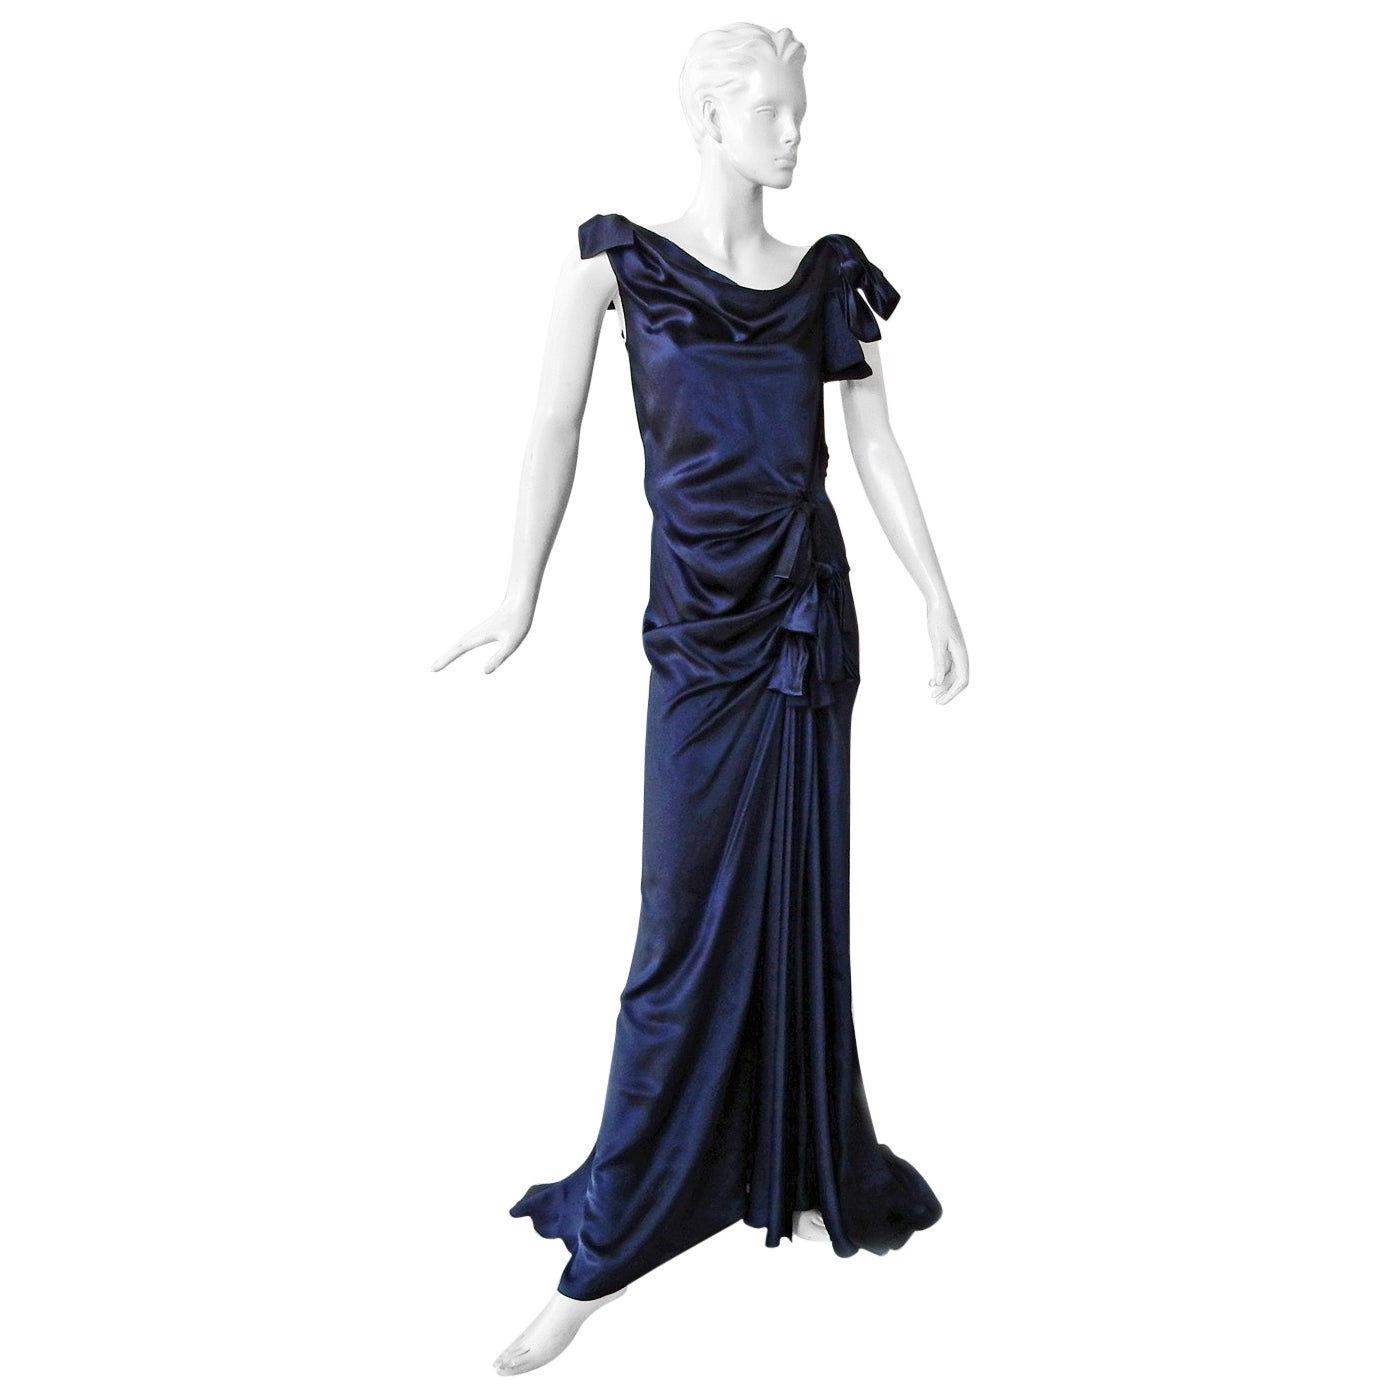 Nina Ricci Stunning Deco Inspired Bows Bias Cut Silk Dress Gown   Red Carpet!